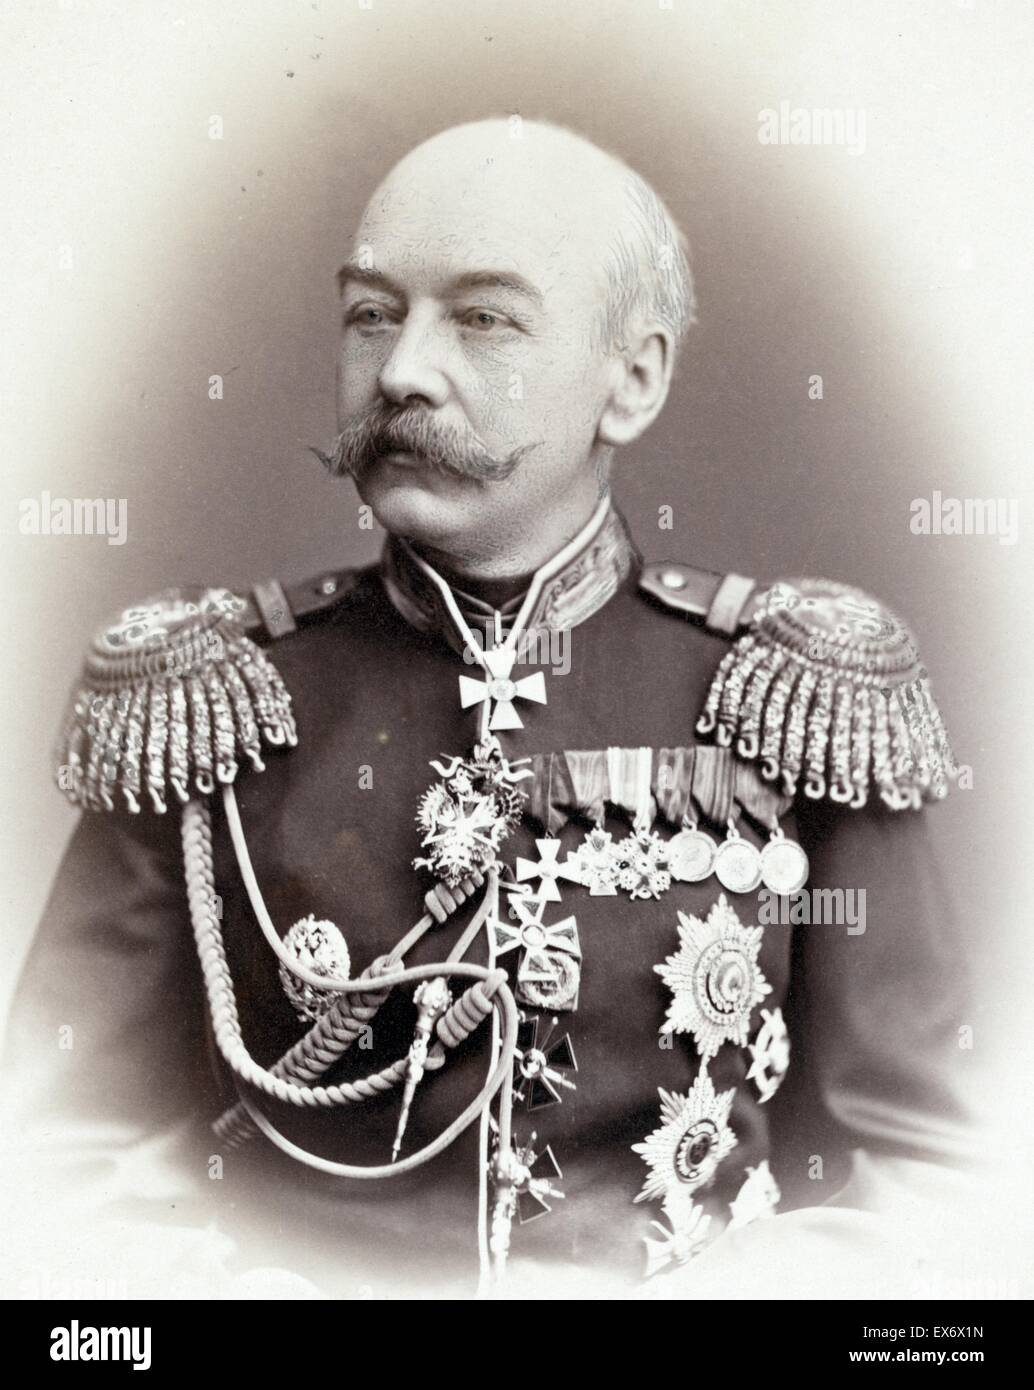 Portrait of Konstantin von Kaufman I (1818-1882) first Governor-General of Russian Turkestan. Dated 1905 - Stock Image